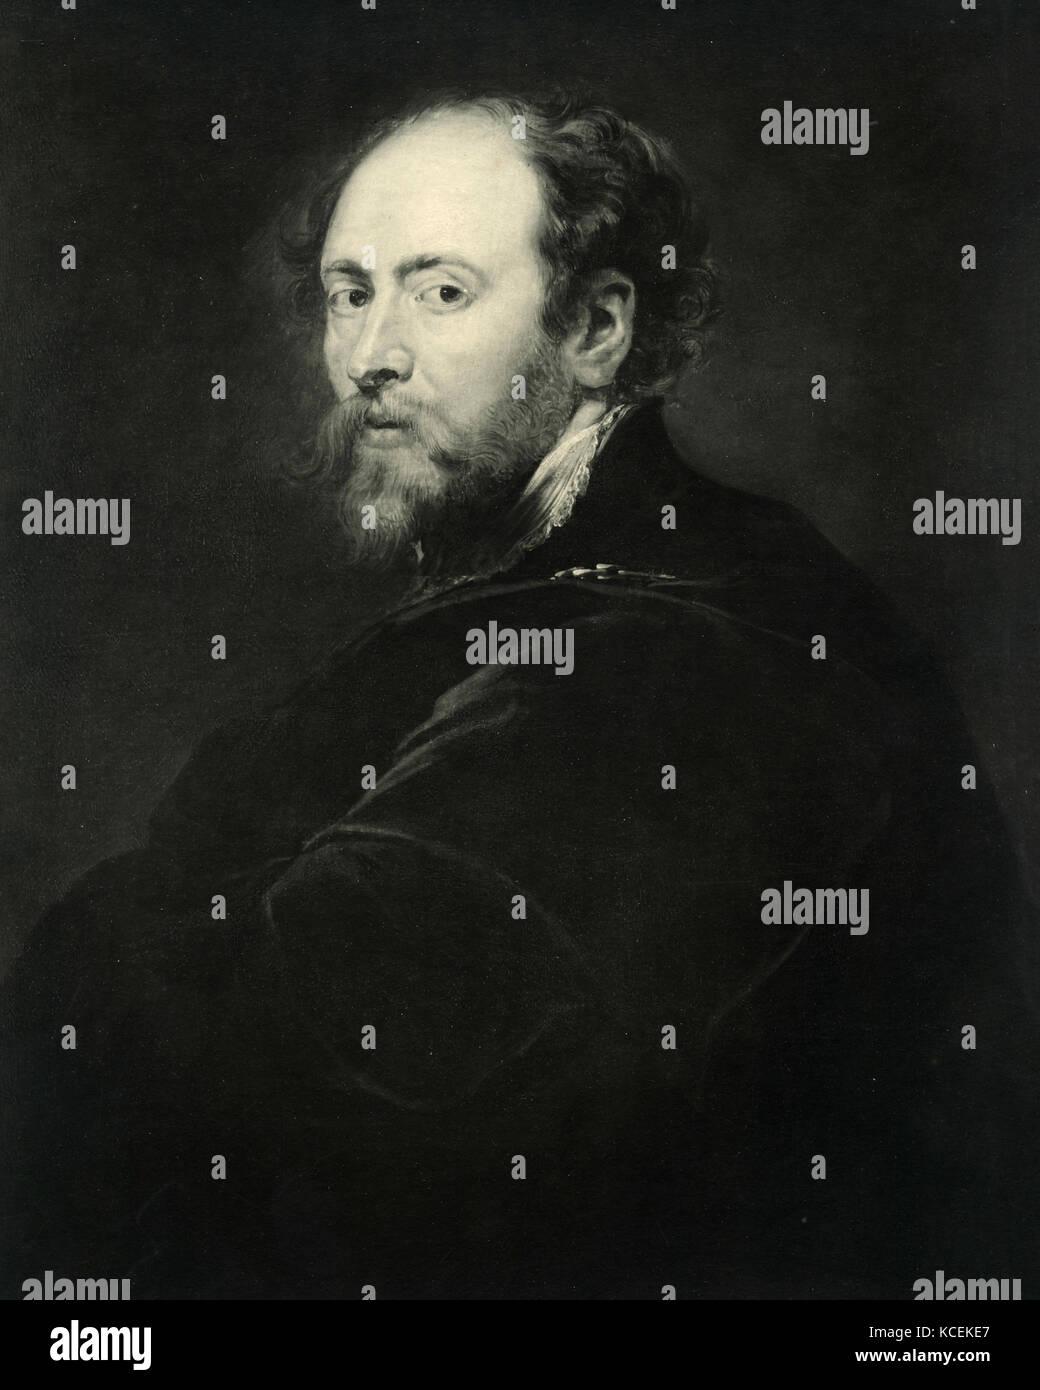 Self-portrait of Rubens - Stock Image